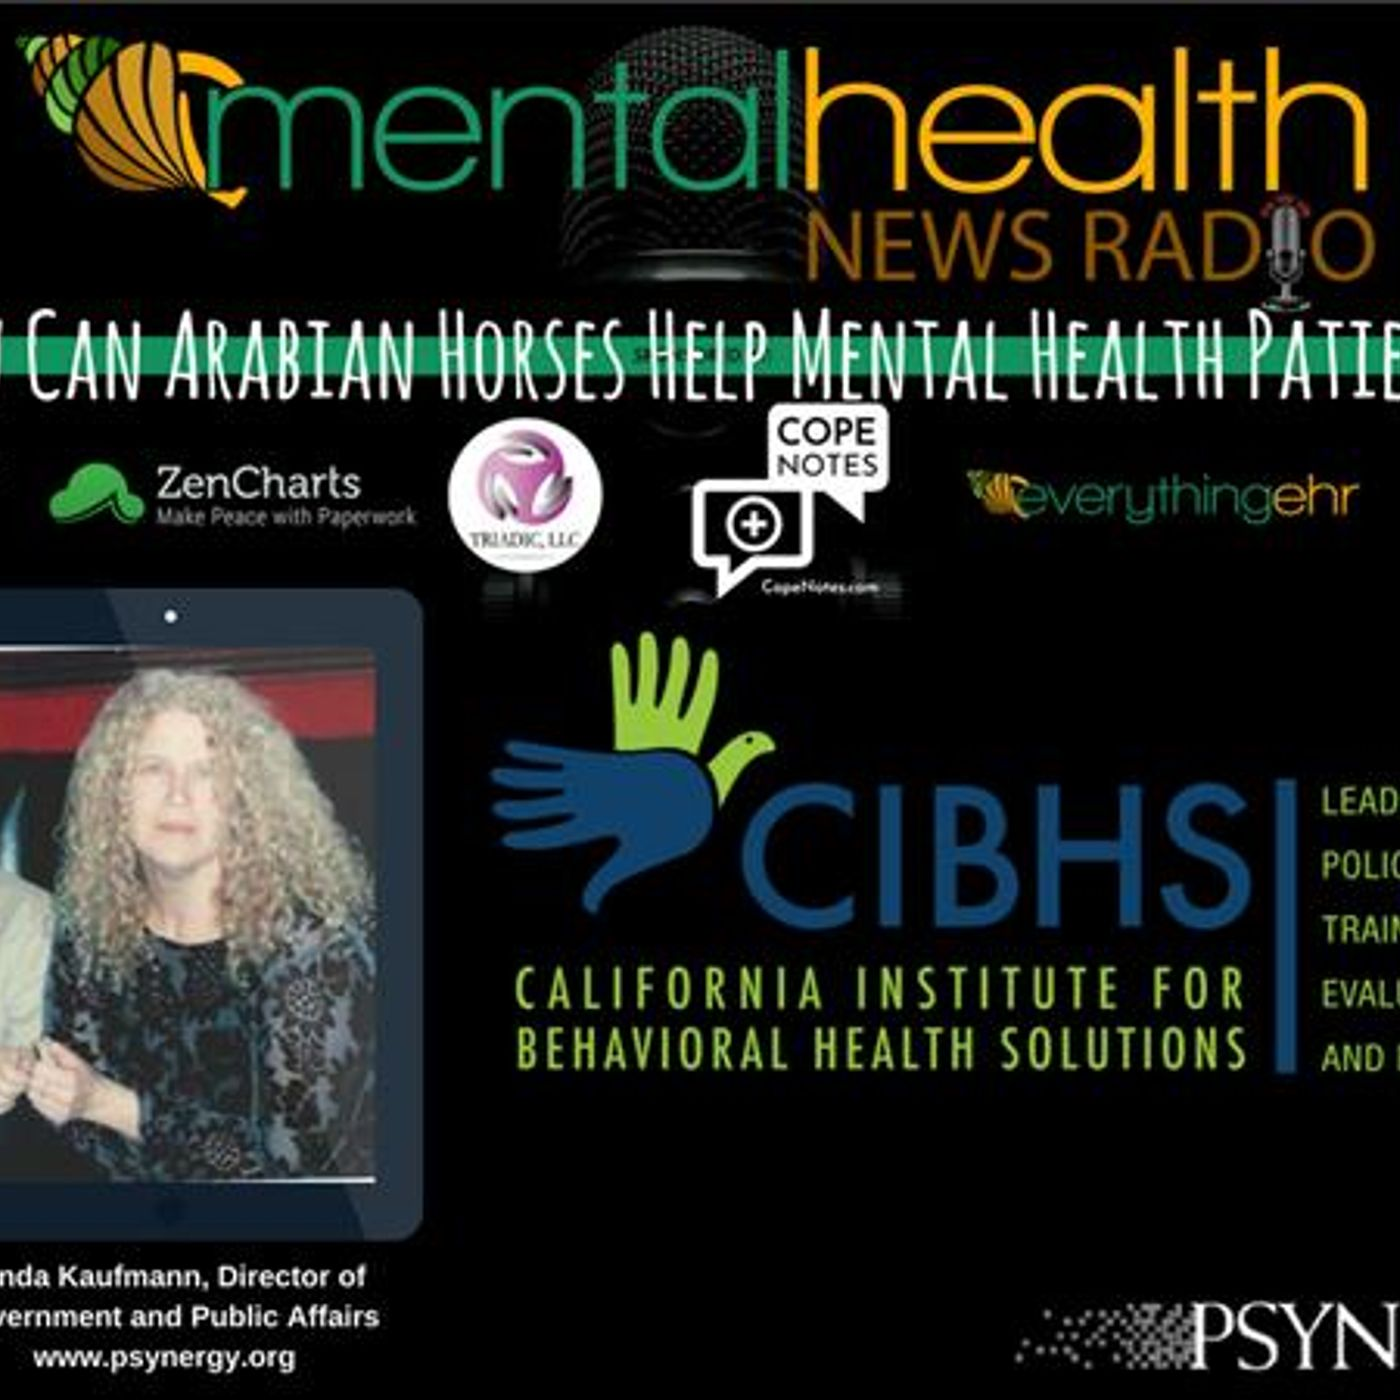 Mental Health News Radio - How Can Arabian Horses Help Mental Health Patients?